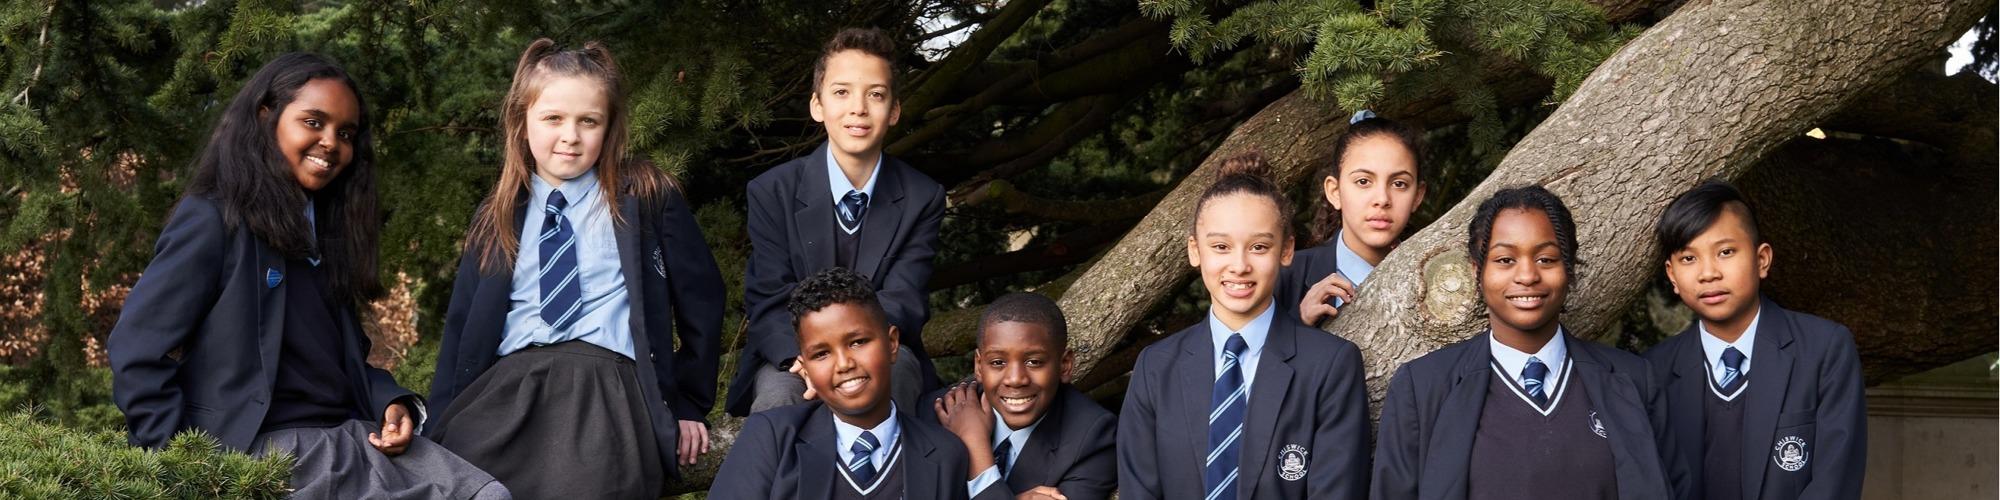 20 02 12.Chiswick School.2018